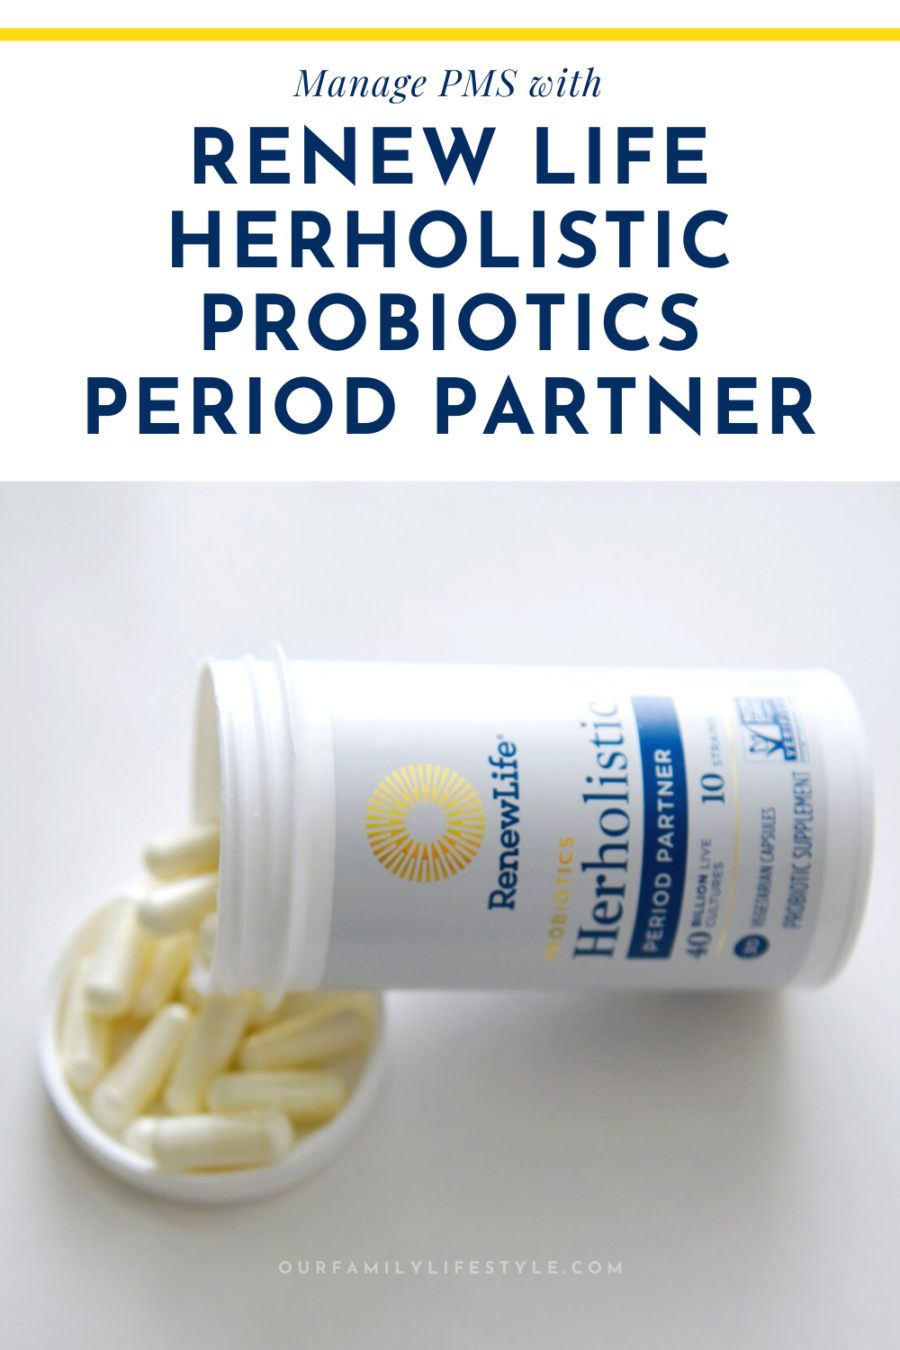 Manage PMS with Renew Life Herholistic Probiotics Period Partner